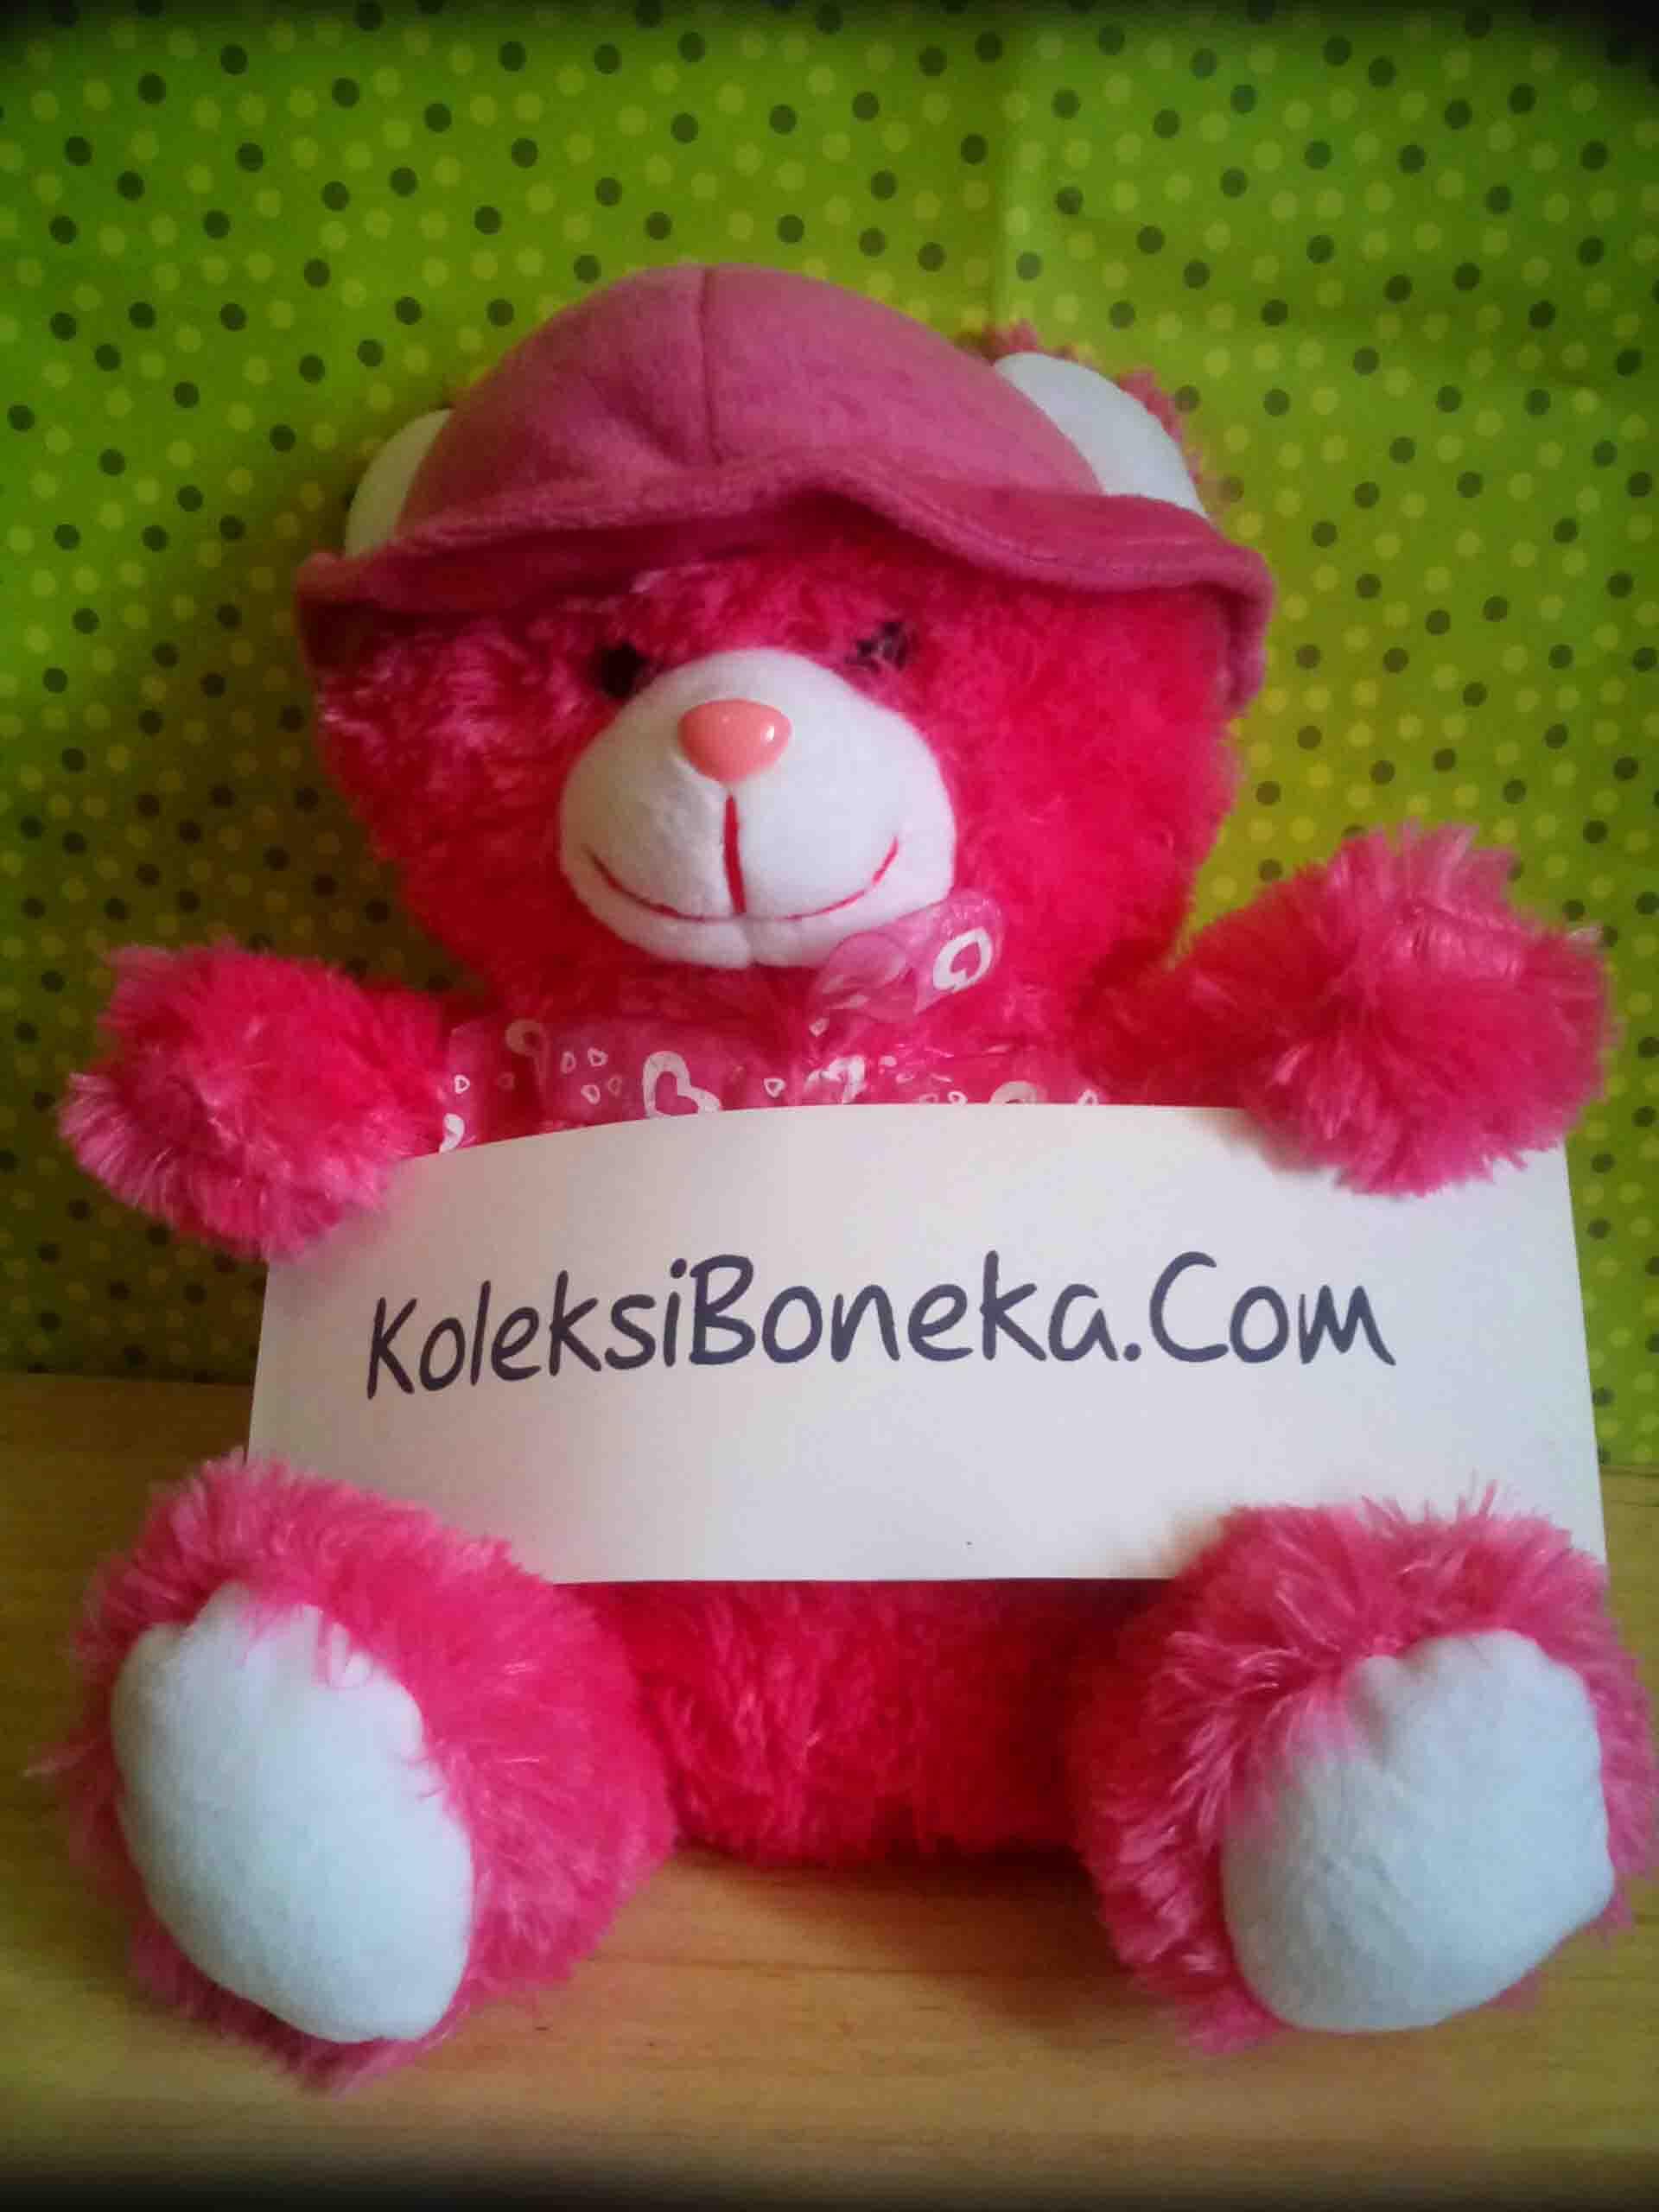 Jual Boneka Teddy Bear Bertopi Warna Pink Ukuran Sedang1